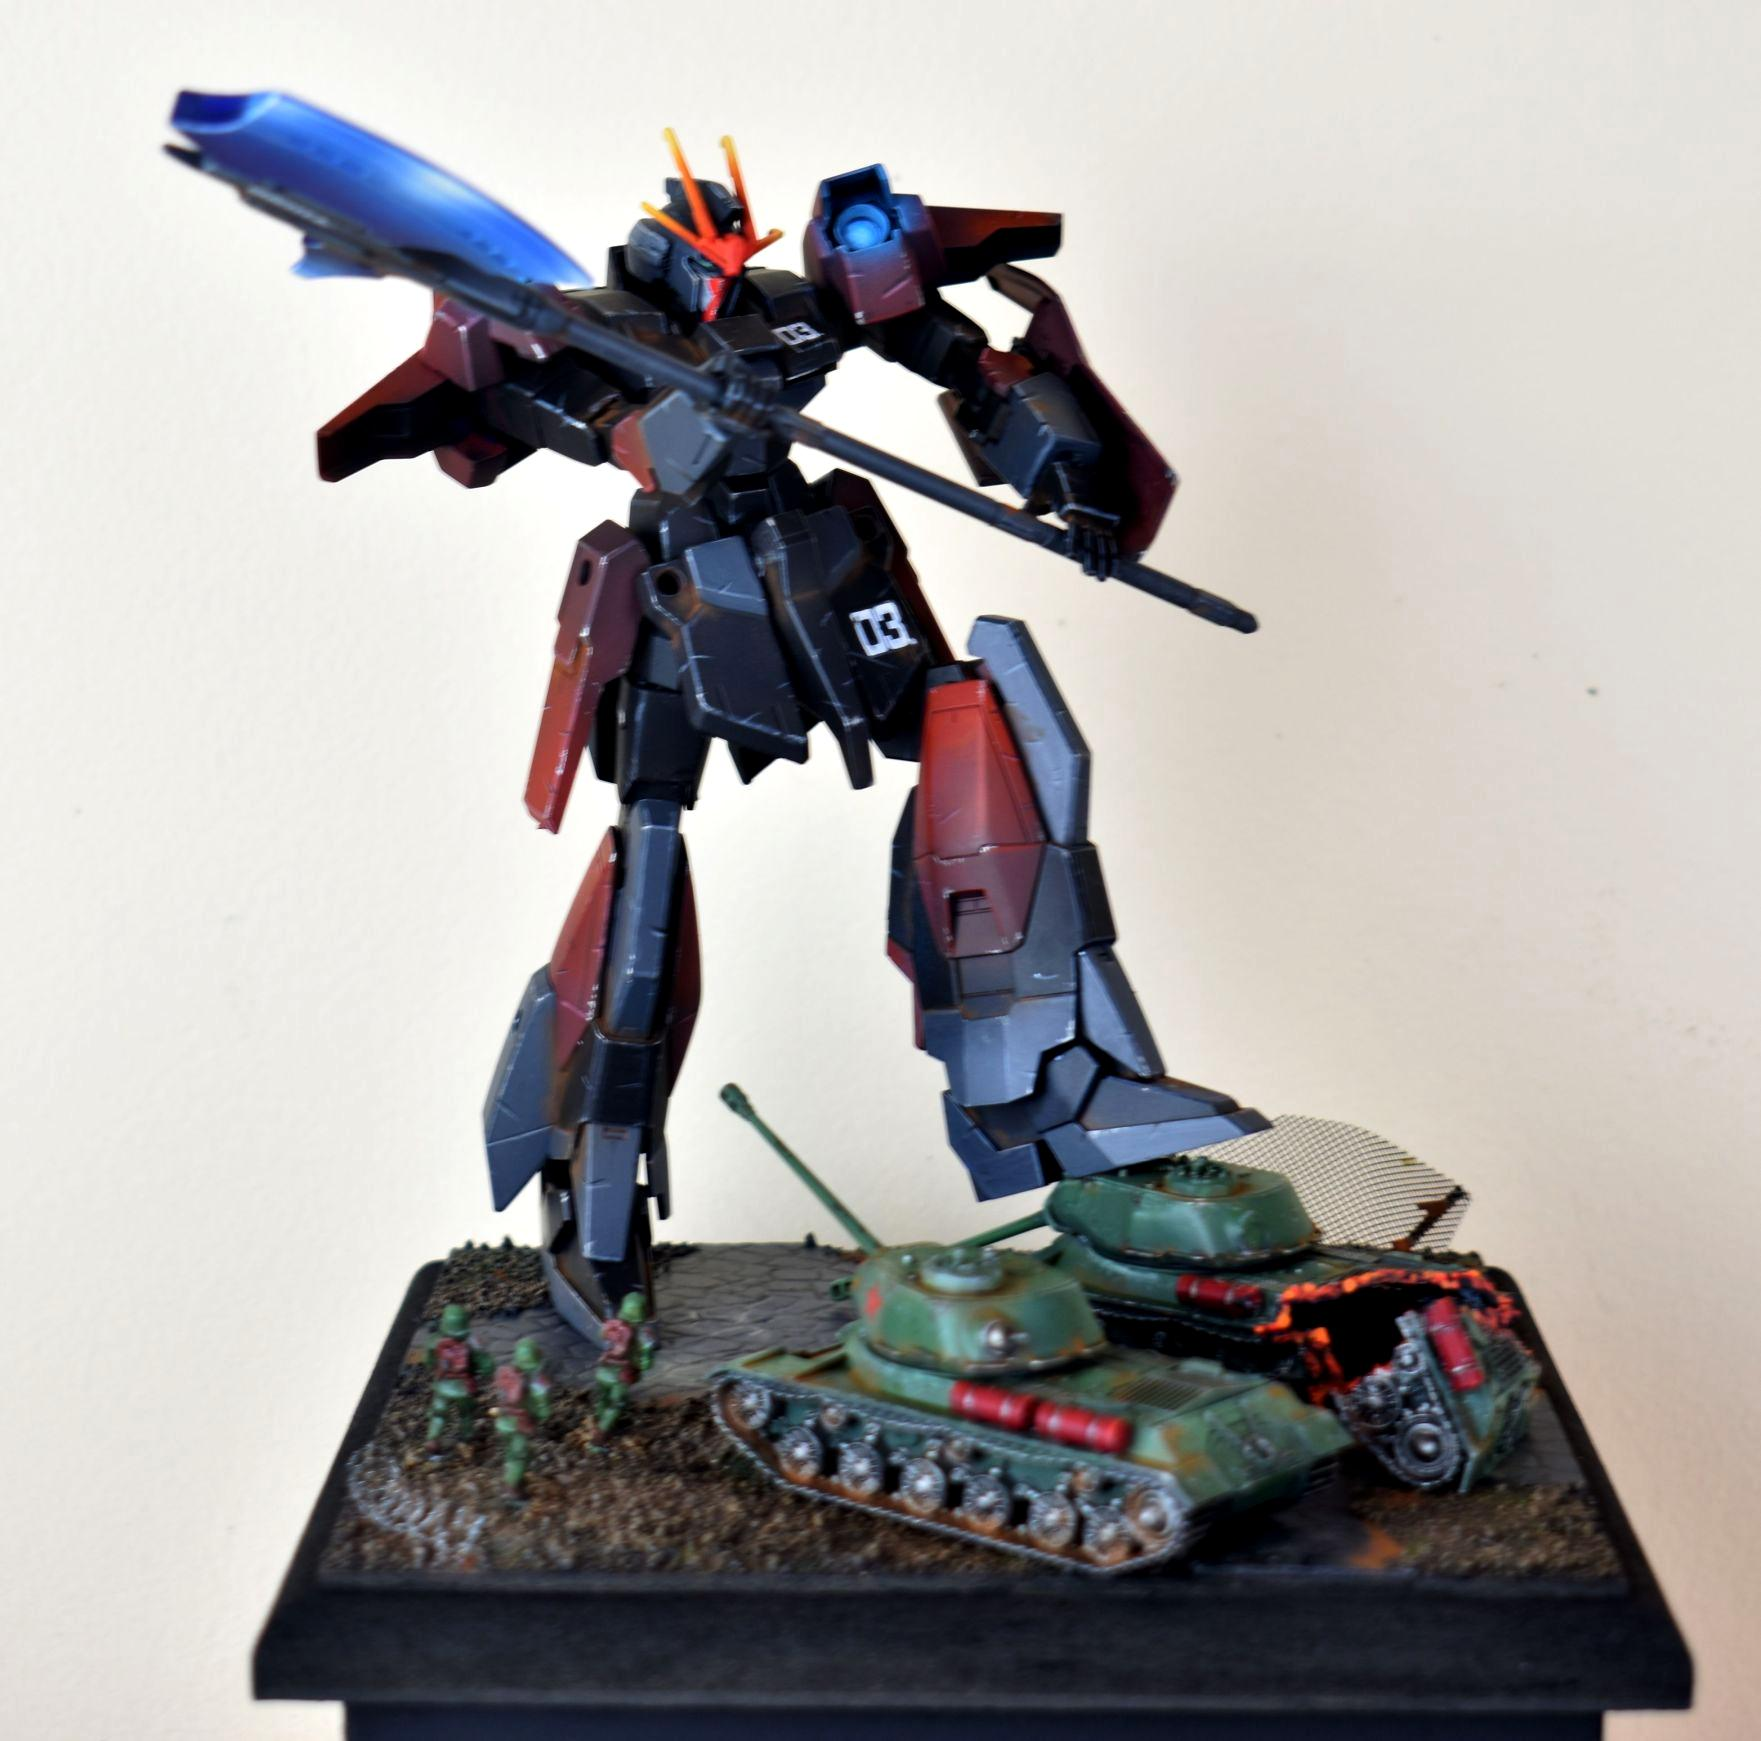 Diorama, Gundam, Object Source Lighting